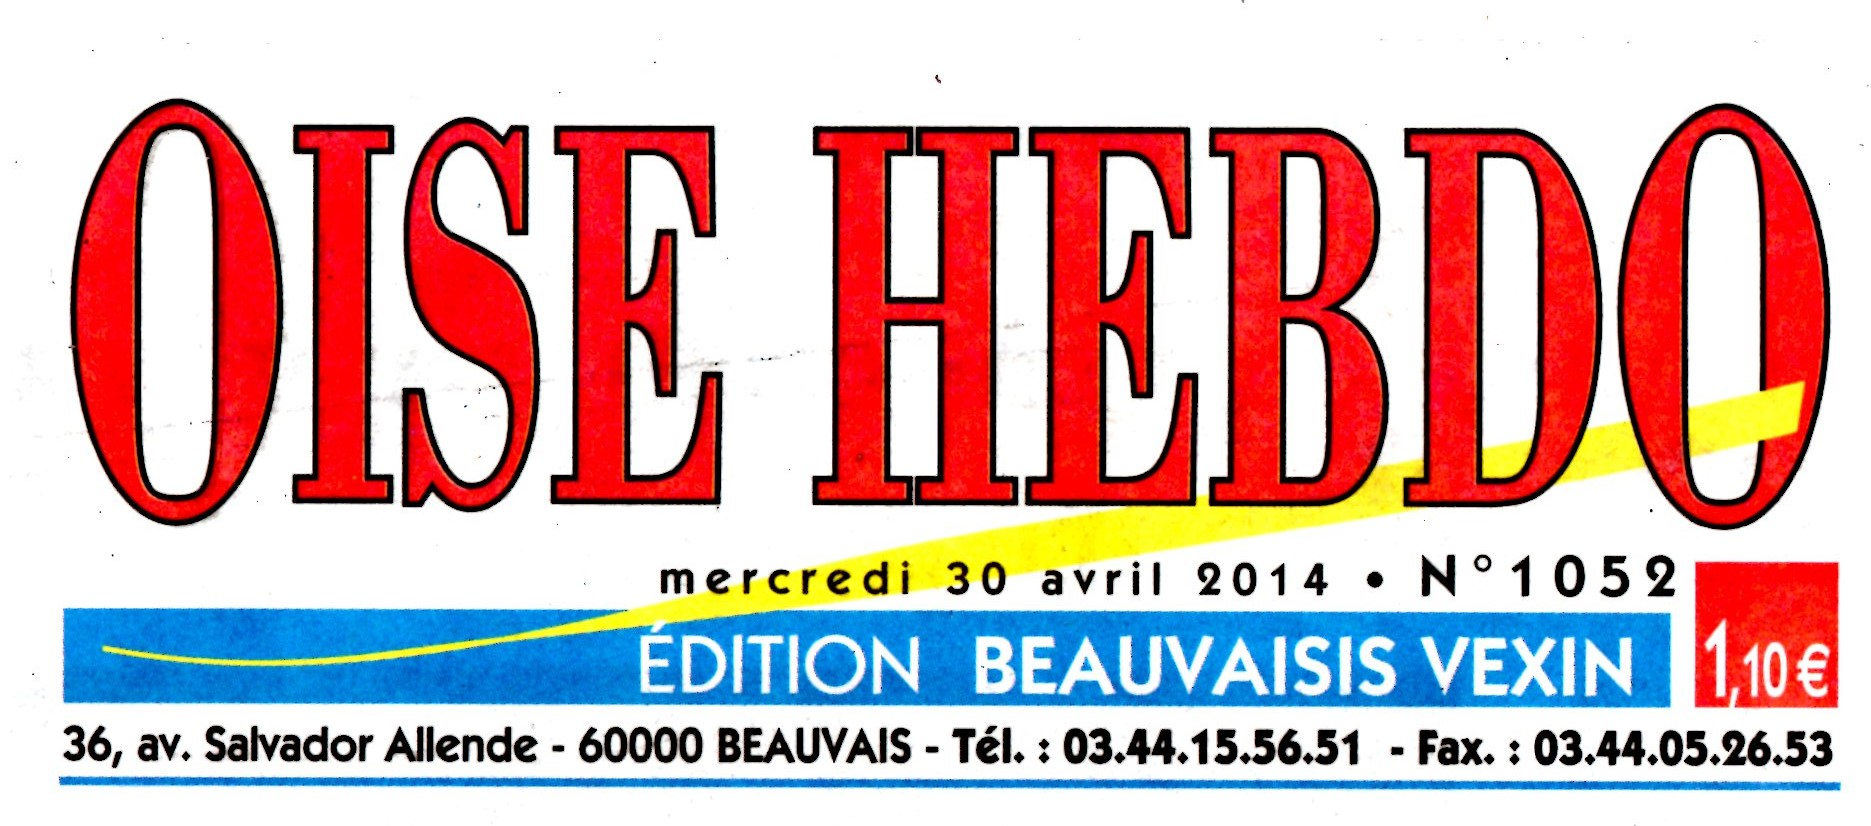 L OISE HEBDO 30 AVRIL 2014001